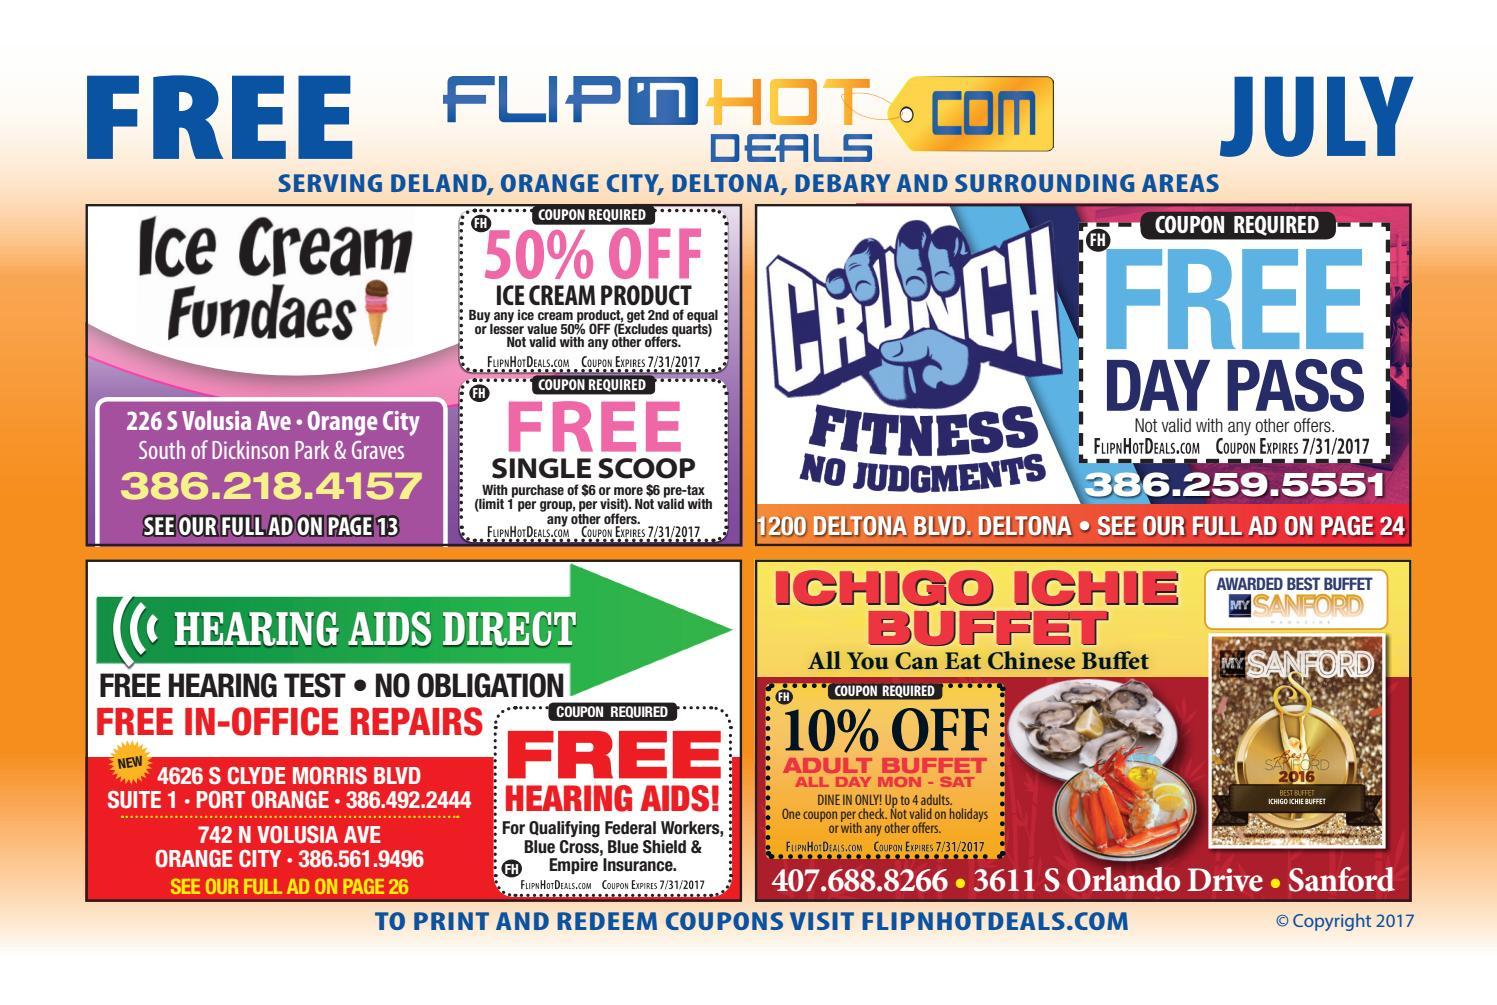 flip nhot deals coupon book july 2017 deland area by flip nhot rh issuu com buffet city coupons st cloud buffet city coupons brooksville fl